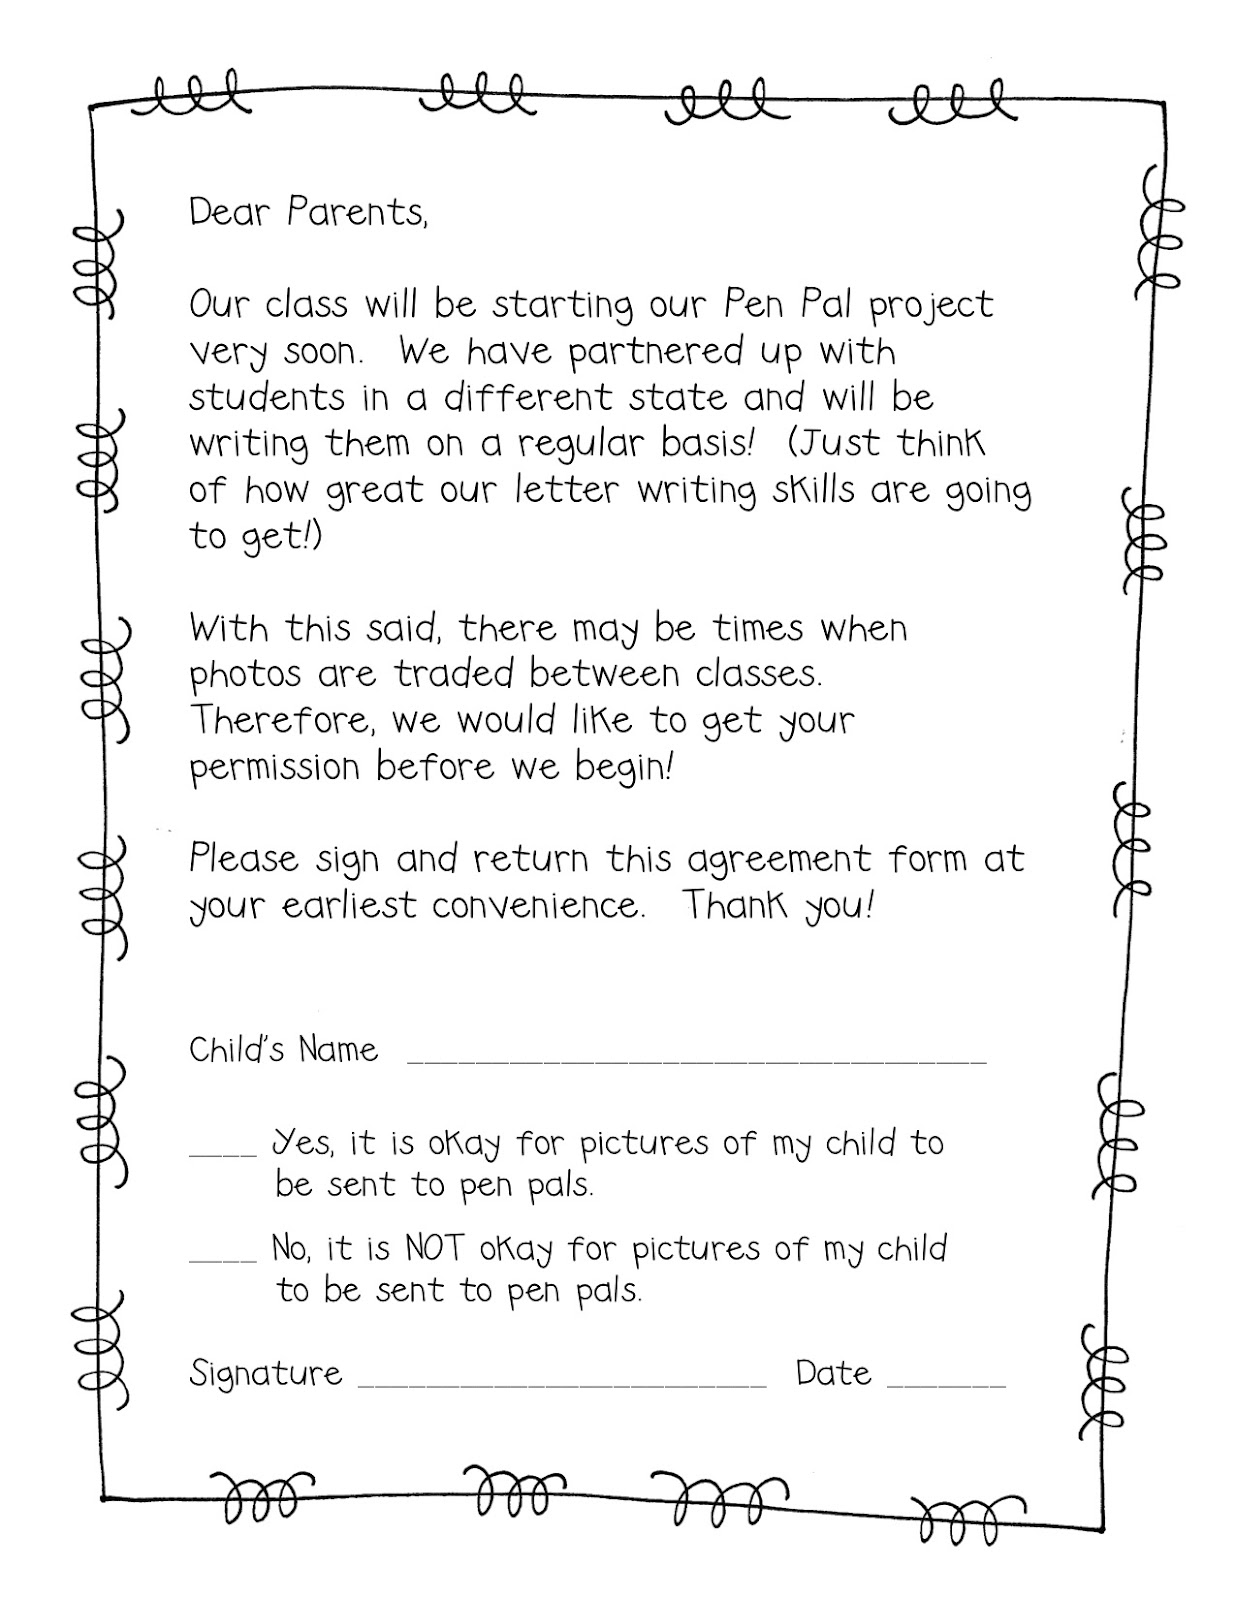 Sponsorship Letter By Parents | Best Resume Job Sites